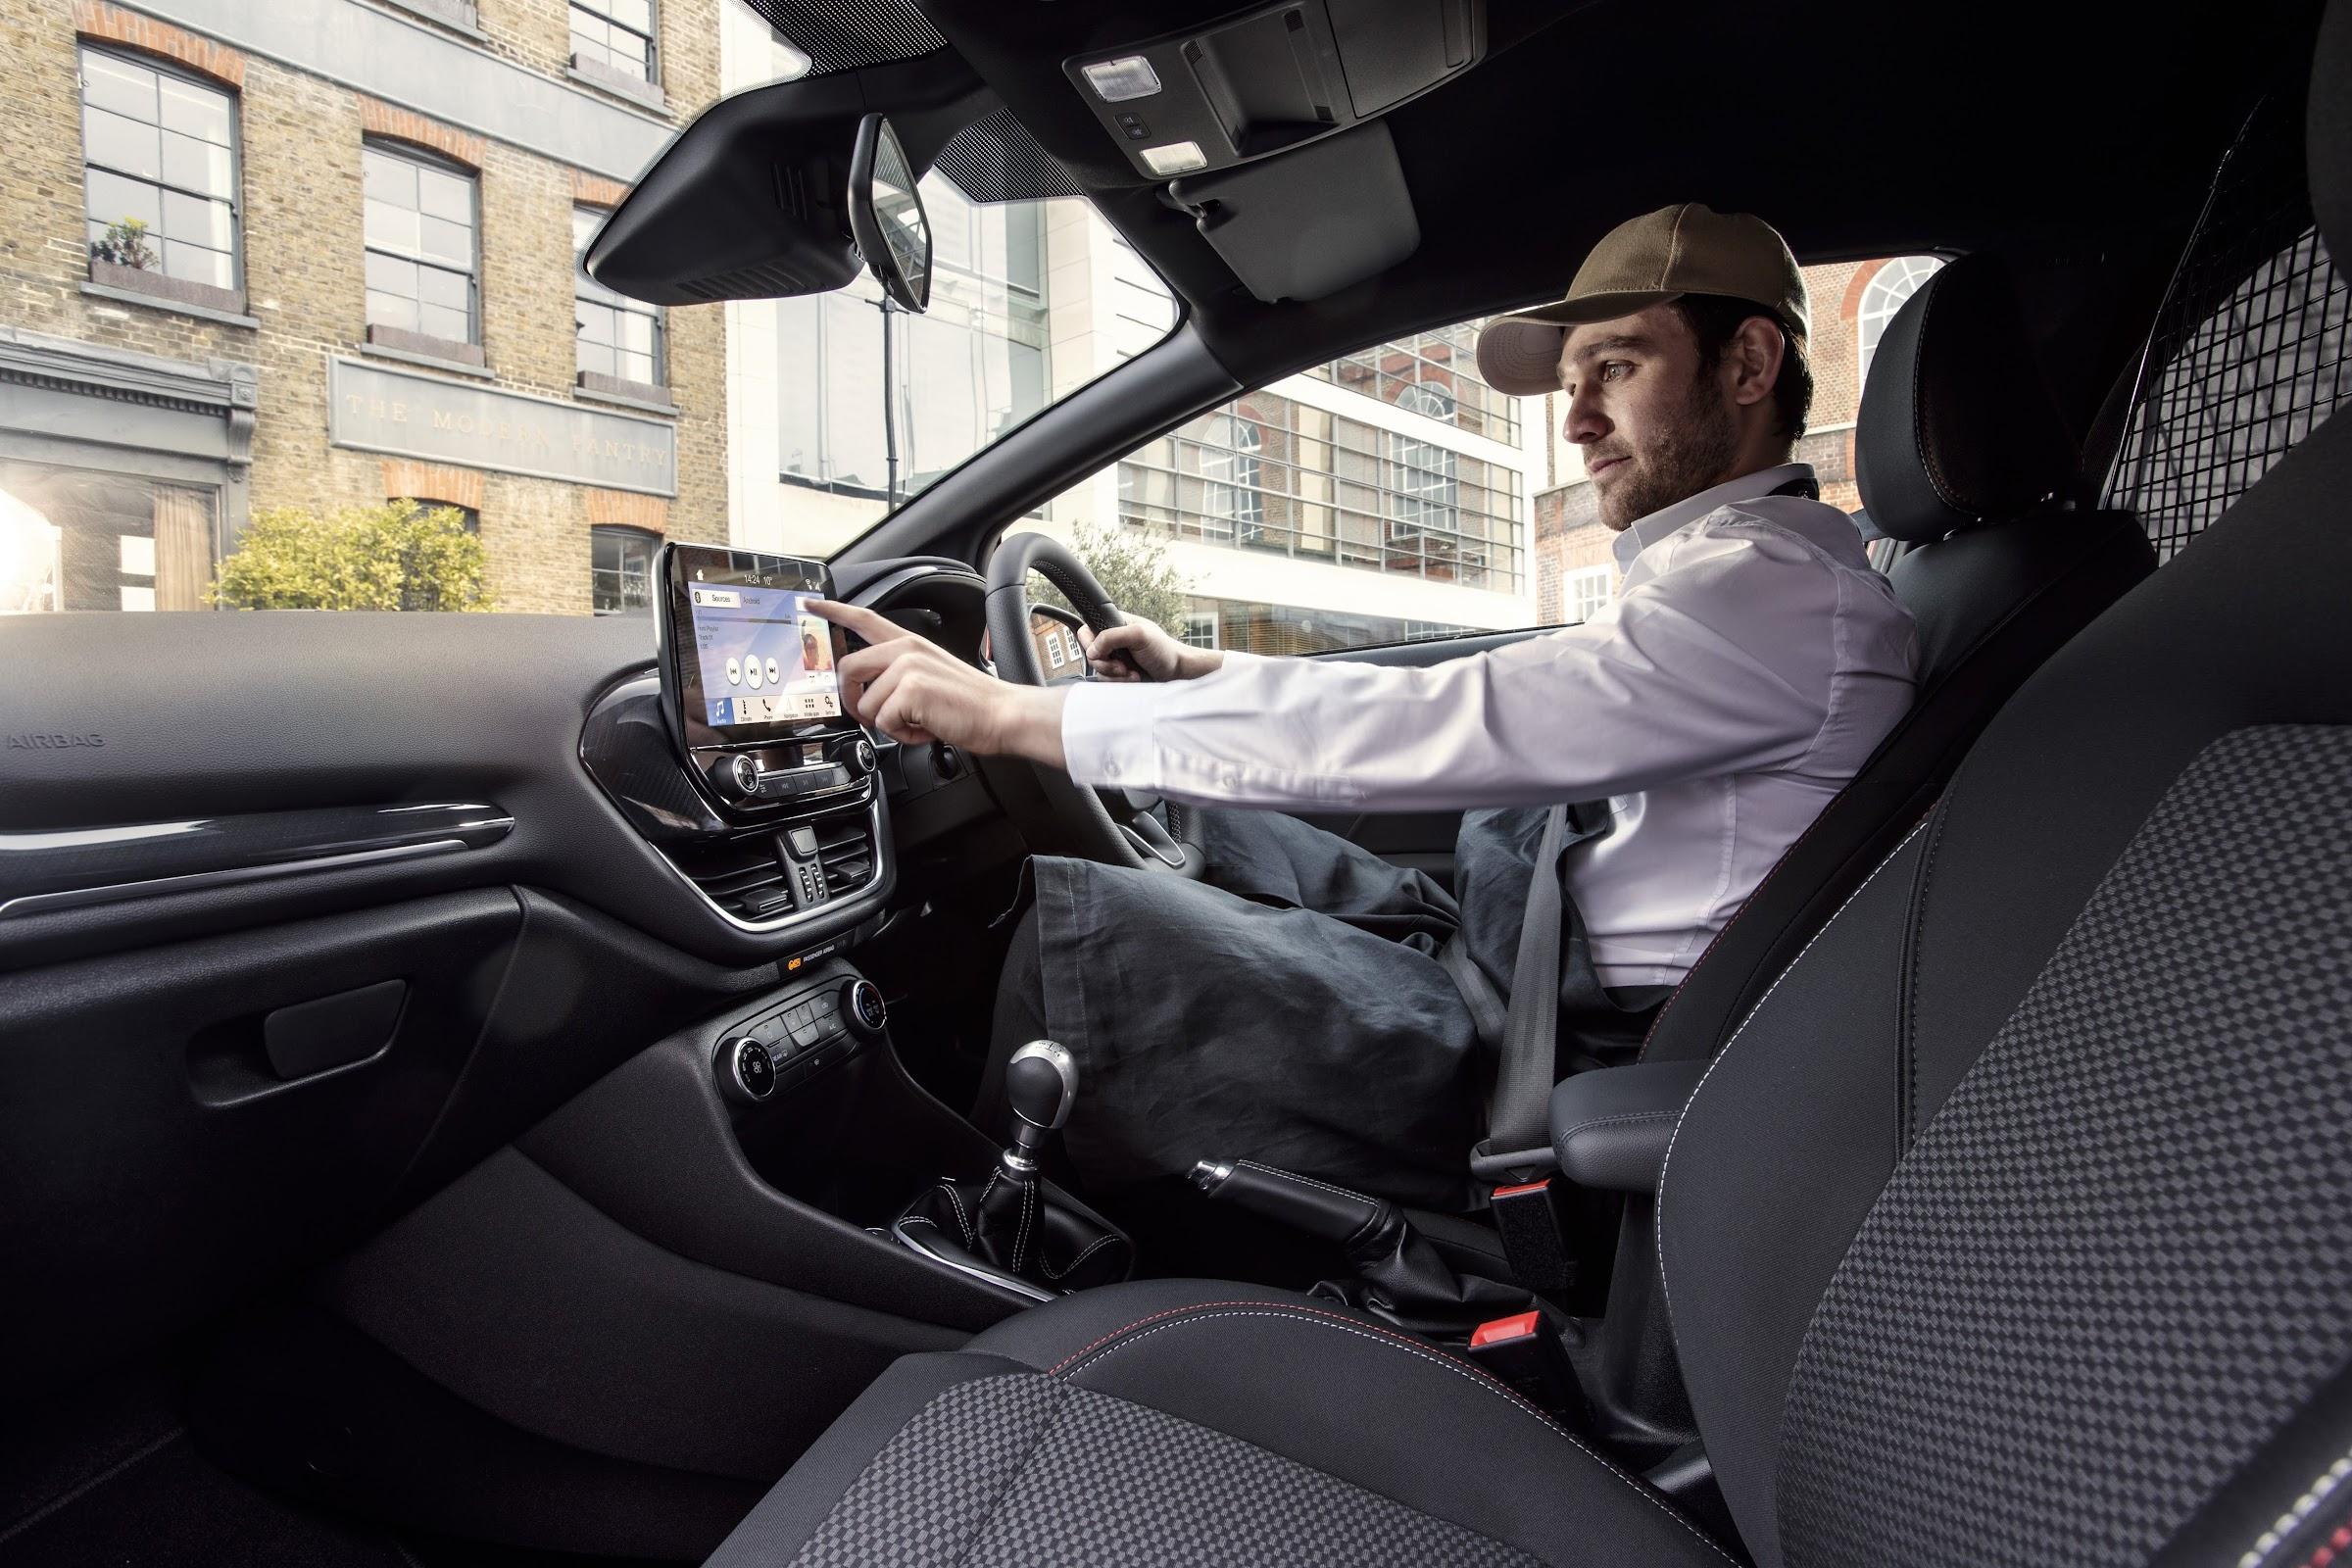 tvrBCW6VRaI dTKYPfSoxDWvjWfoHs02wu4NwoCdjXwDBlwzmyiSXYFtPYu6ABLsbwhgCfIEOev6nQqQW0KzBKc5GTrzjCaKhmZV0lSk8aeG1e7PvG3L0LULyOcLkqelHIy5i8KmxA=w2400 - Nuevo Ford Fiesta Van, más conectado y con versión deportiva